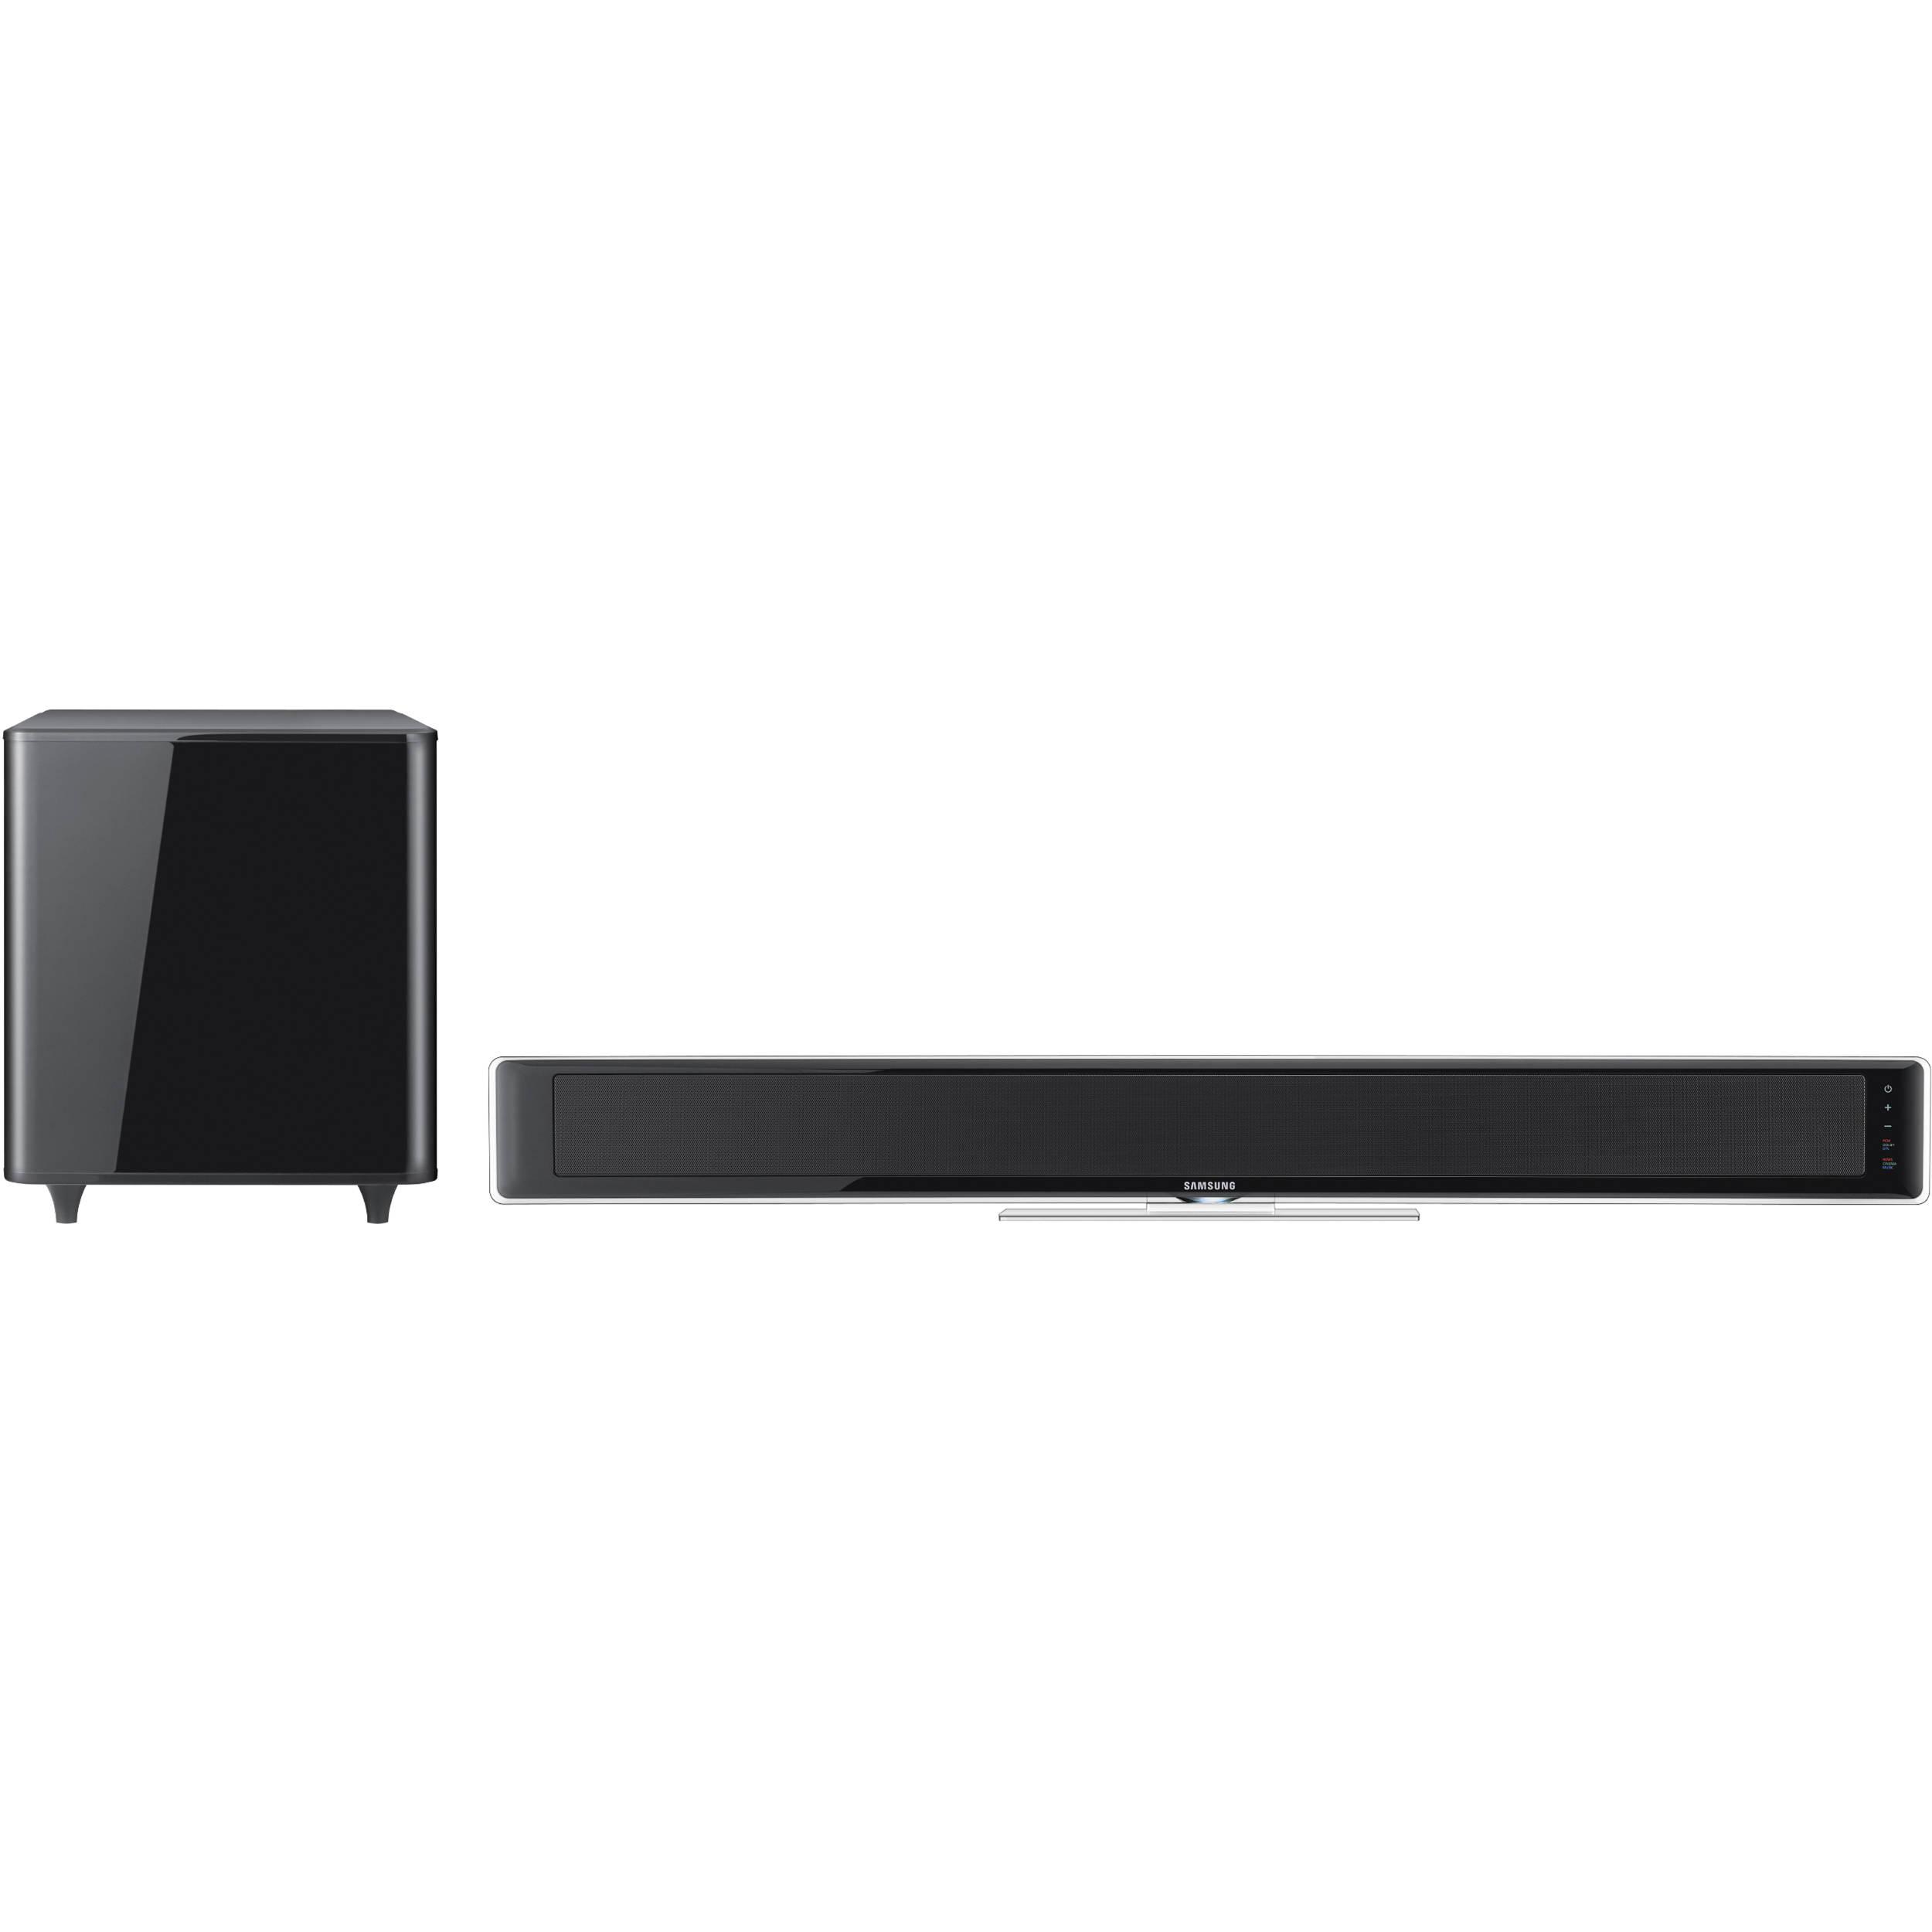 Samsung Ht Ws1 Soundbar Home Theater System Gray